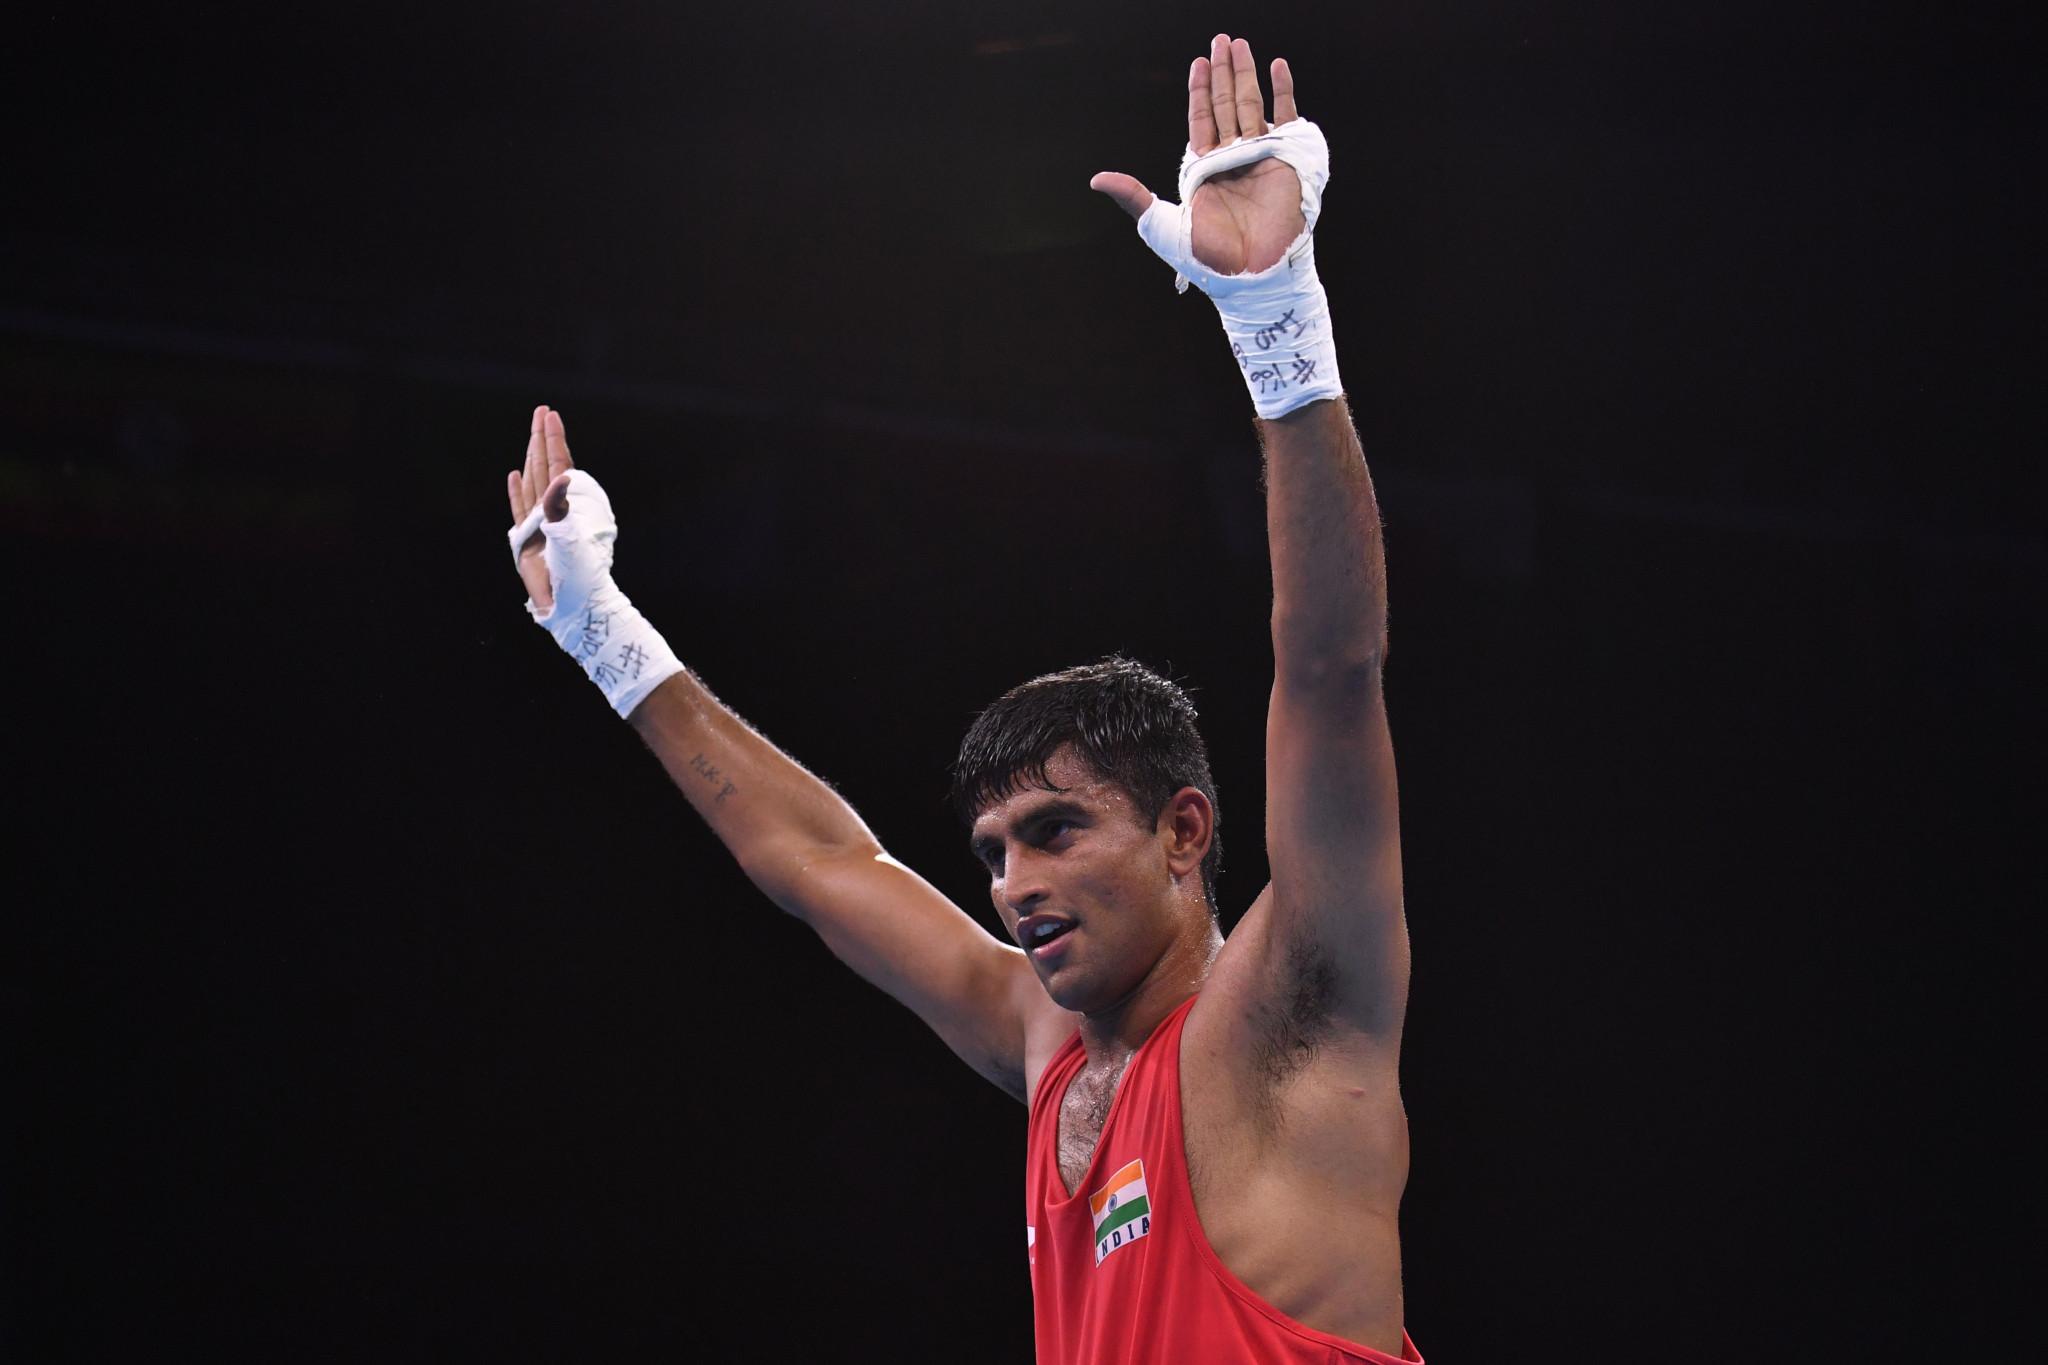 Boxing world bronze medallist Kaushik aiming for gold at Tokyo 2020